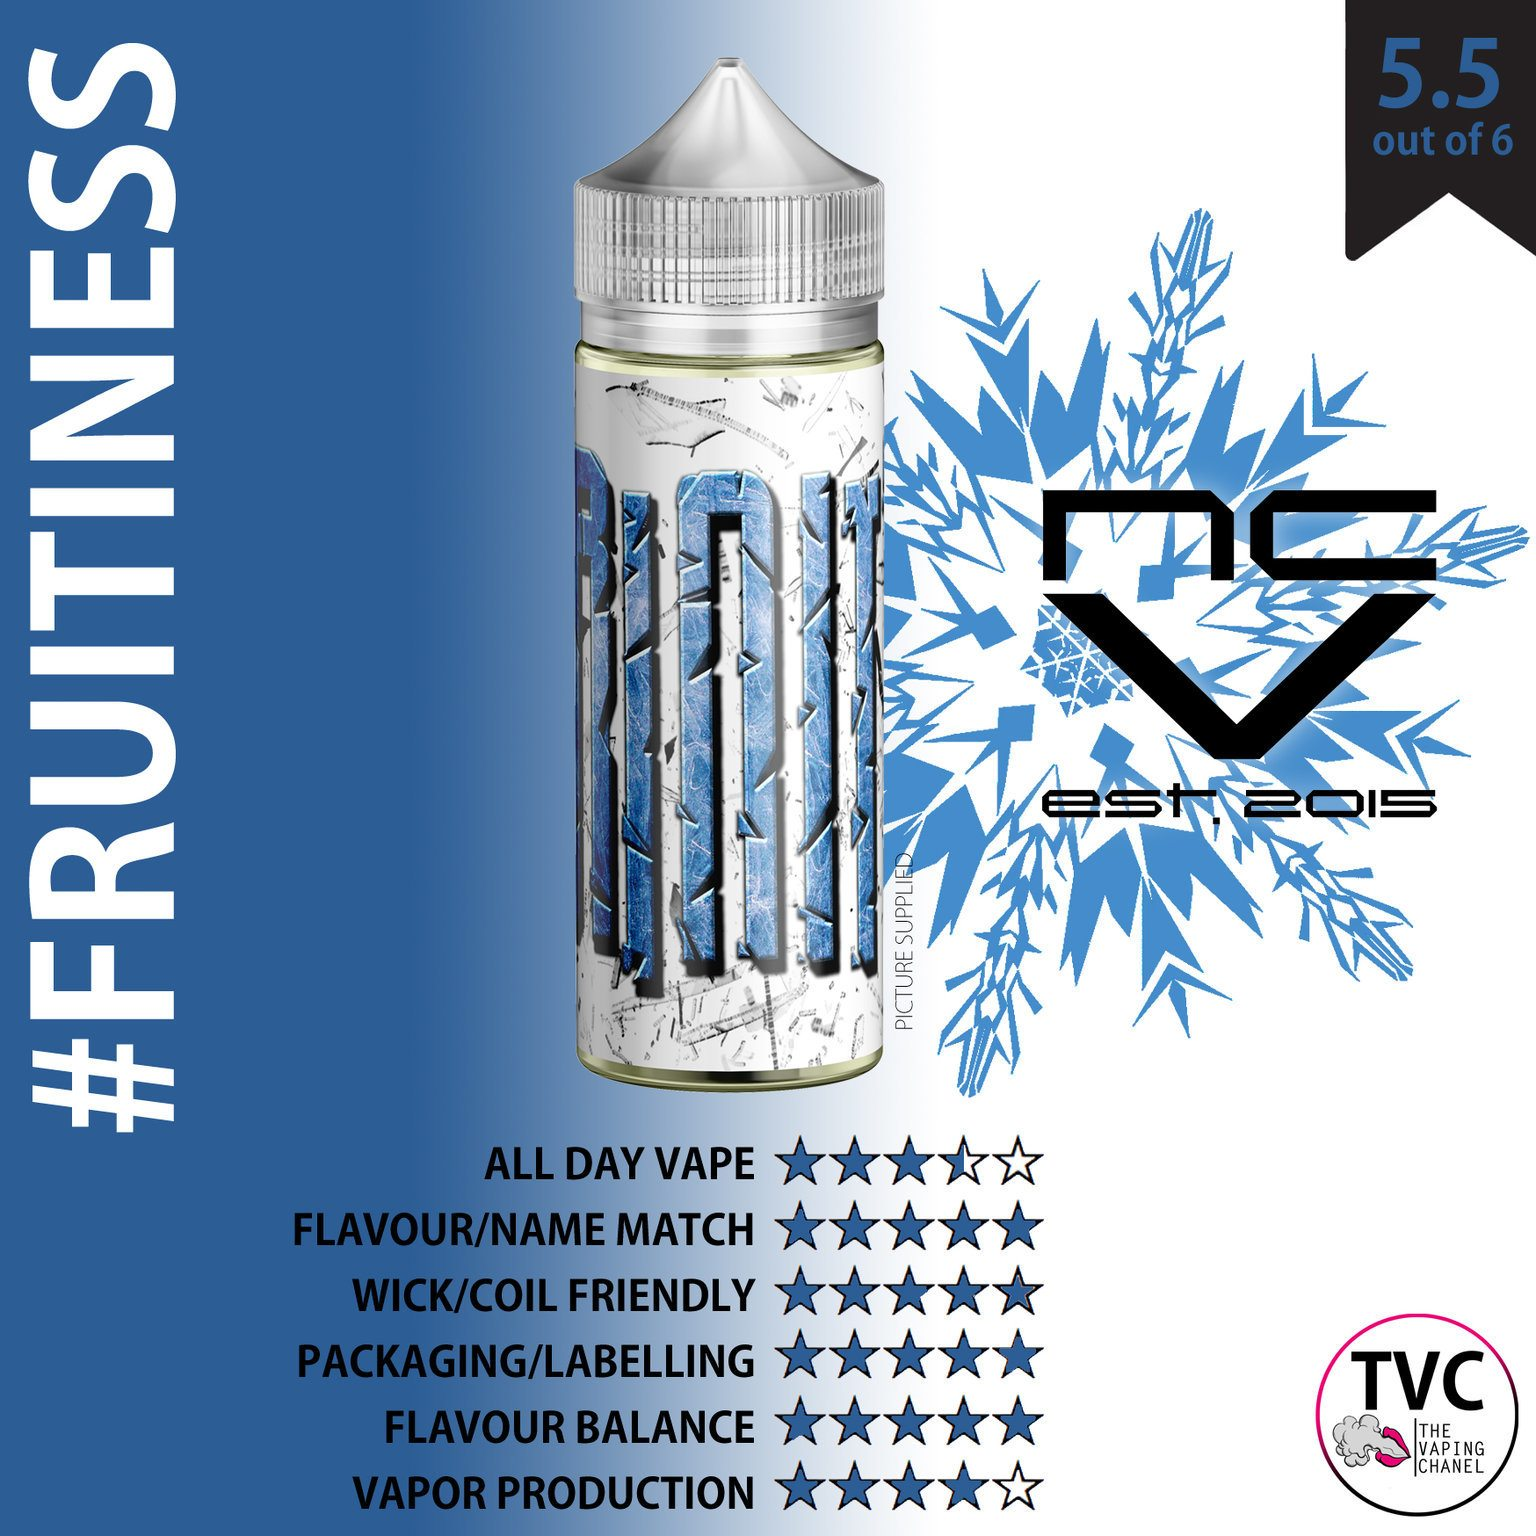 TVC image design